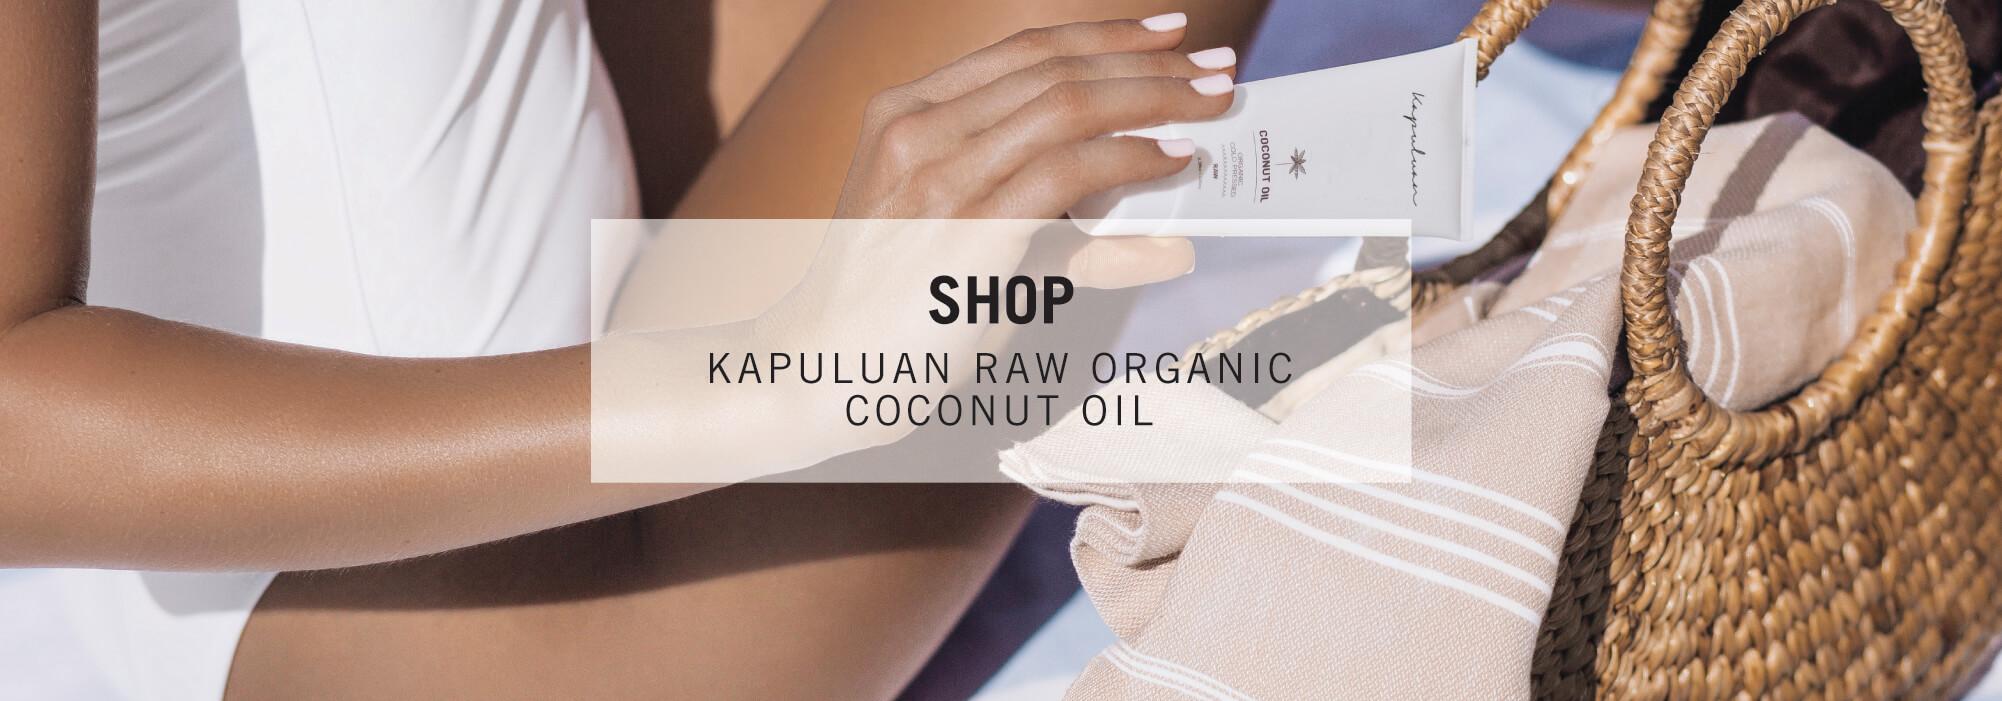 shop raw organic coconut oil for skin